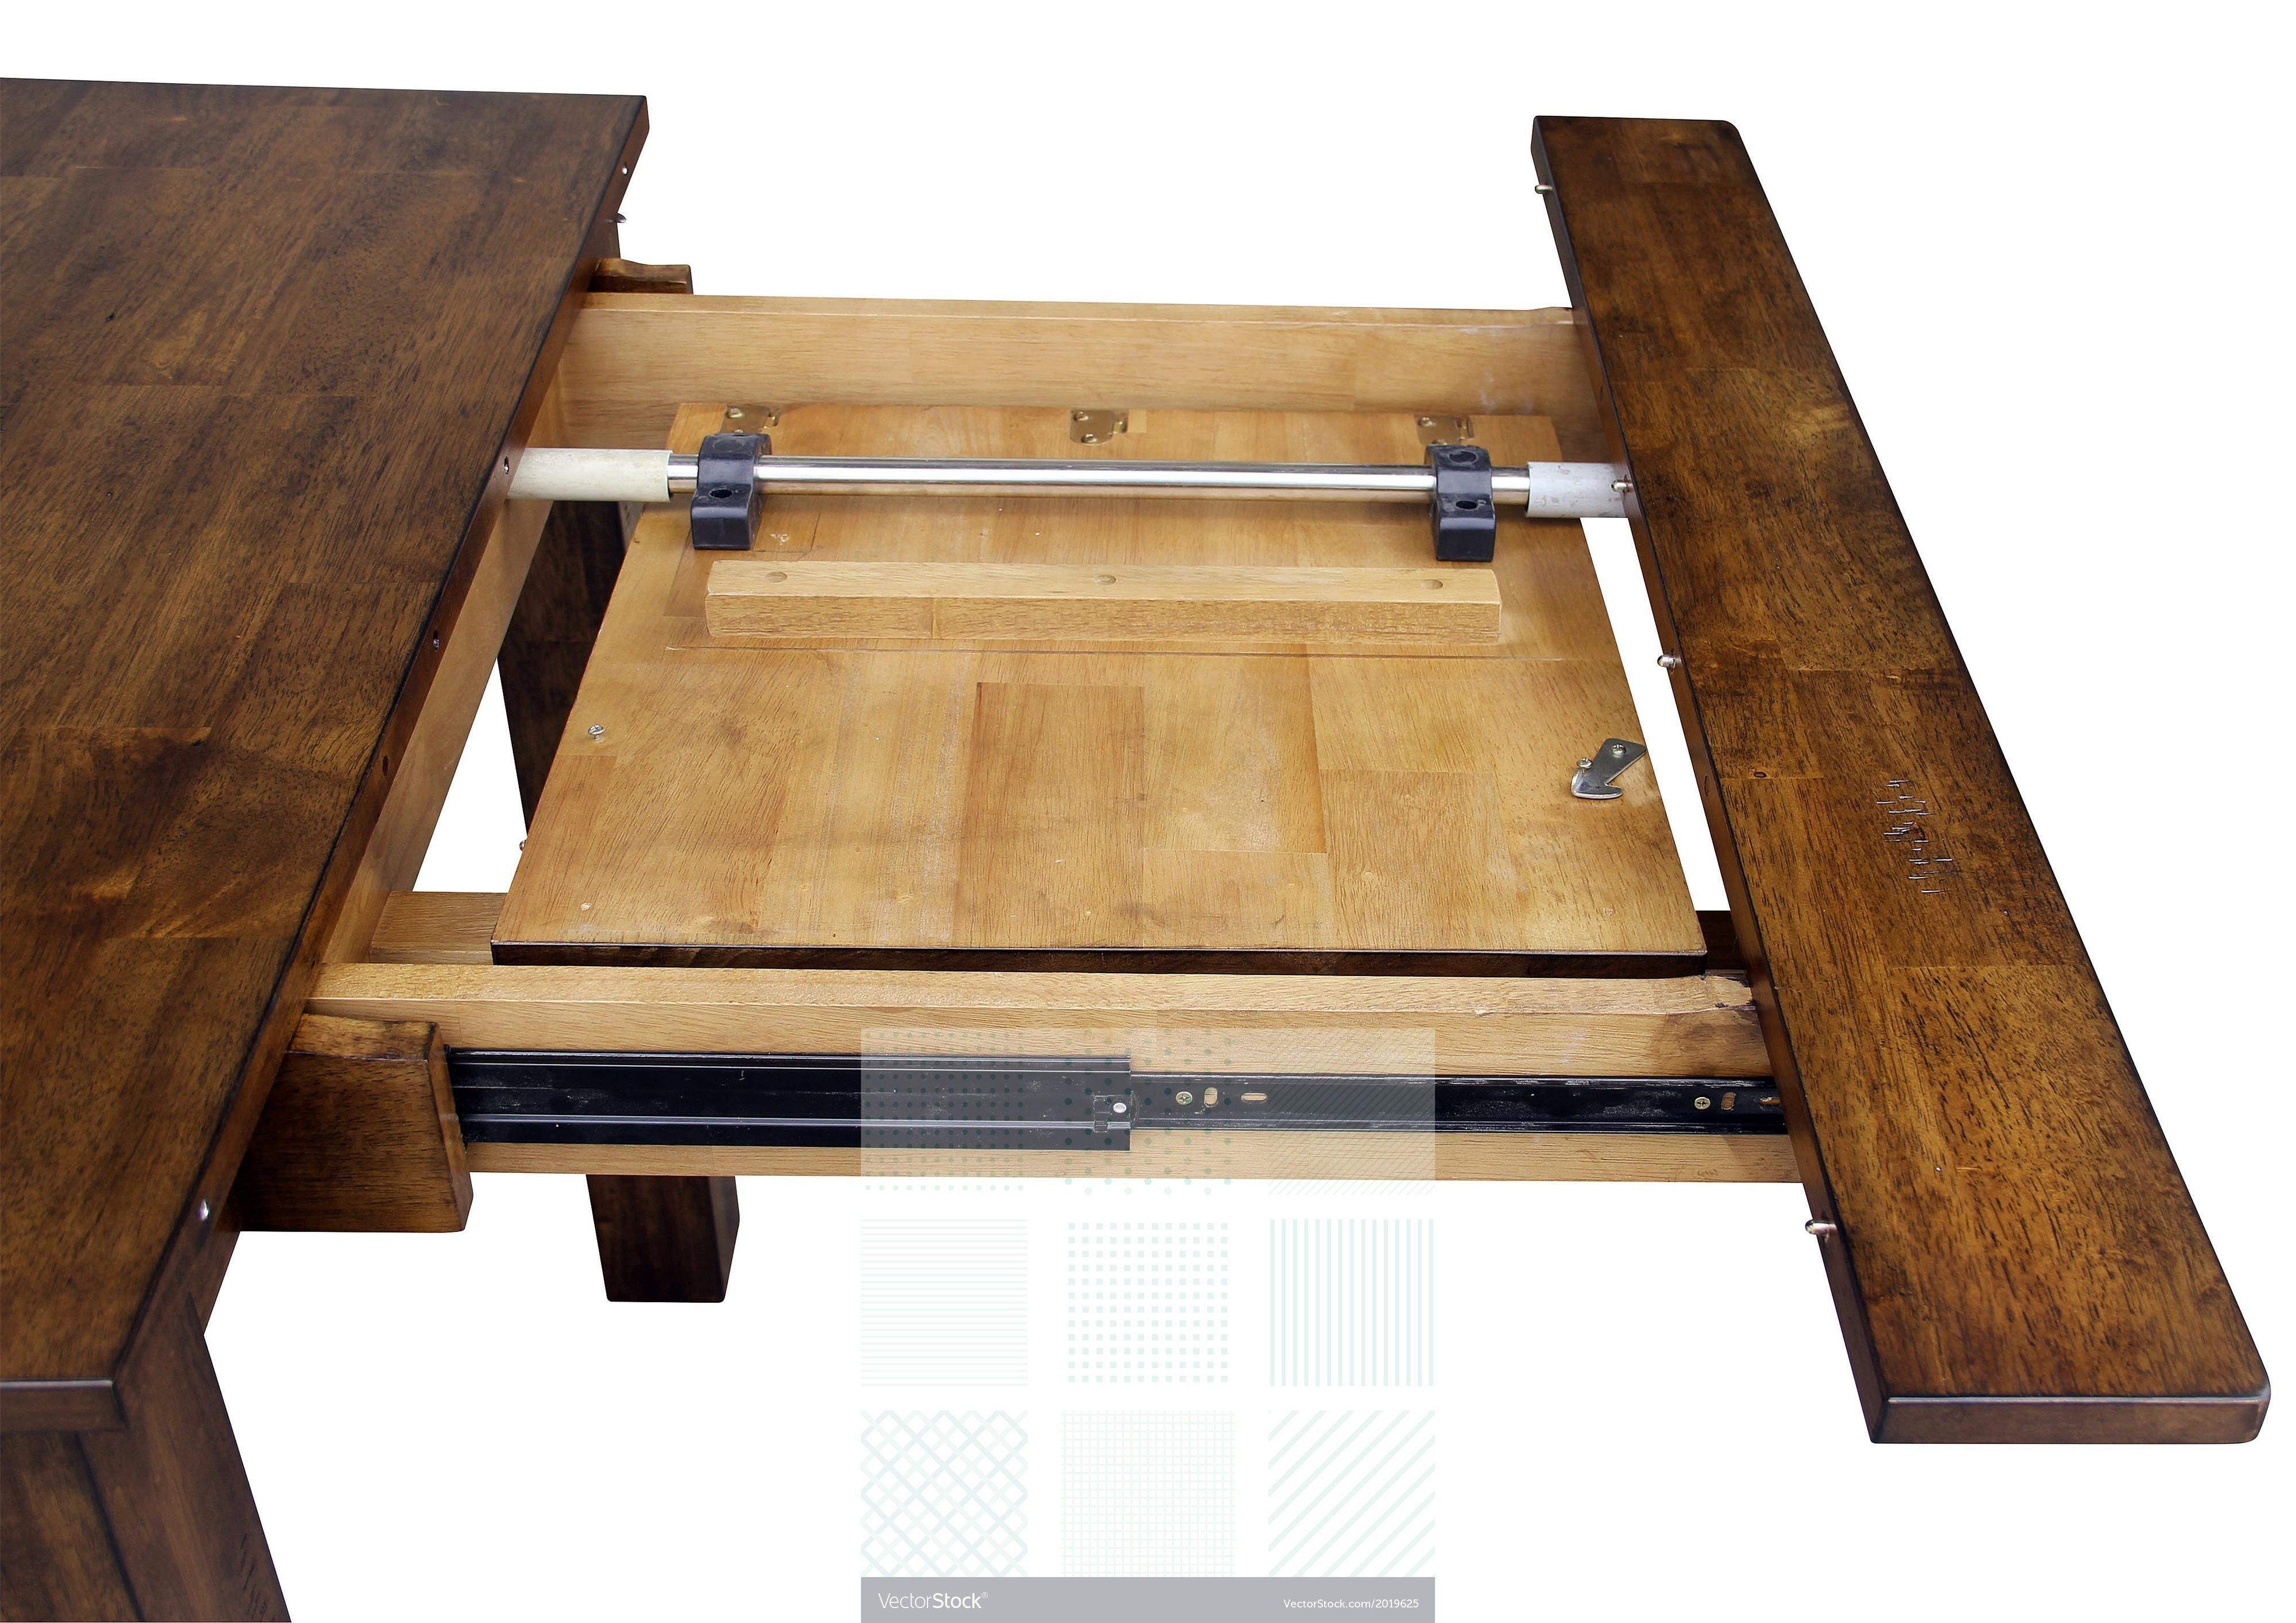 Expandable Leaf Farmhouse Table From James James Www Carpenterjames Com Diy Kitchen Table Diy Dining Room Farmhouse Dining Room Table